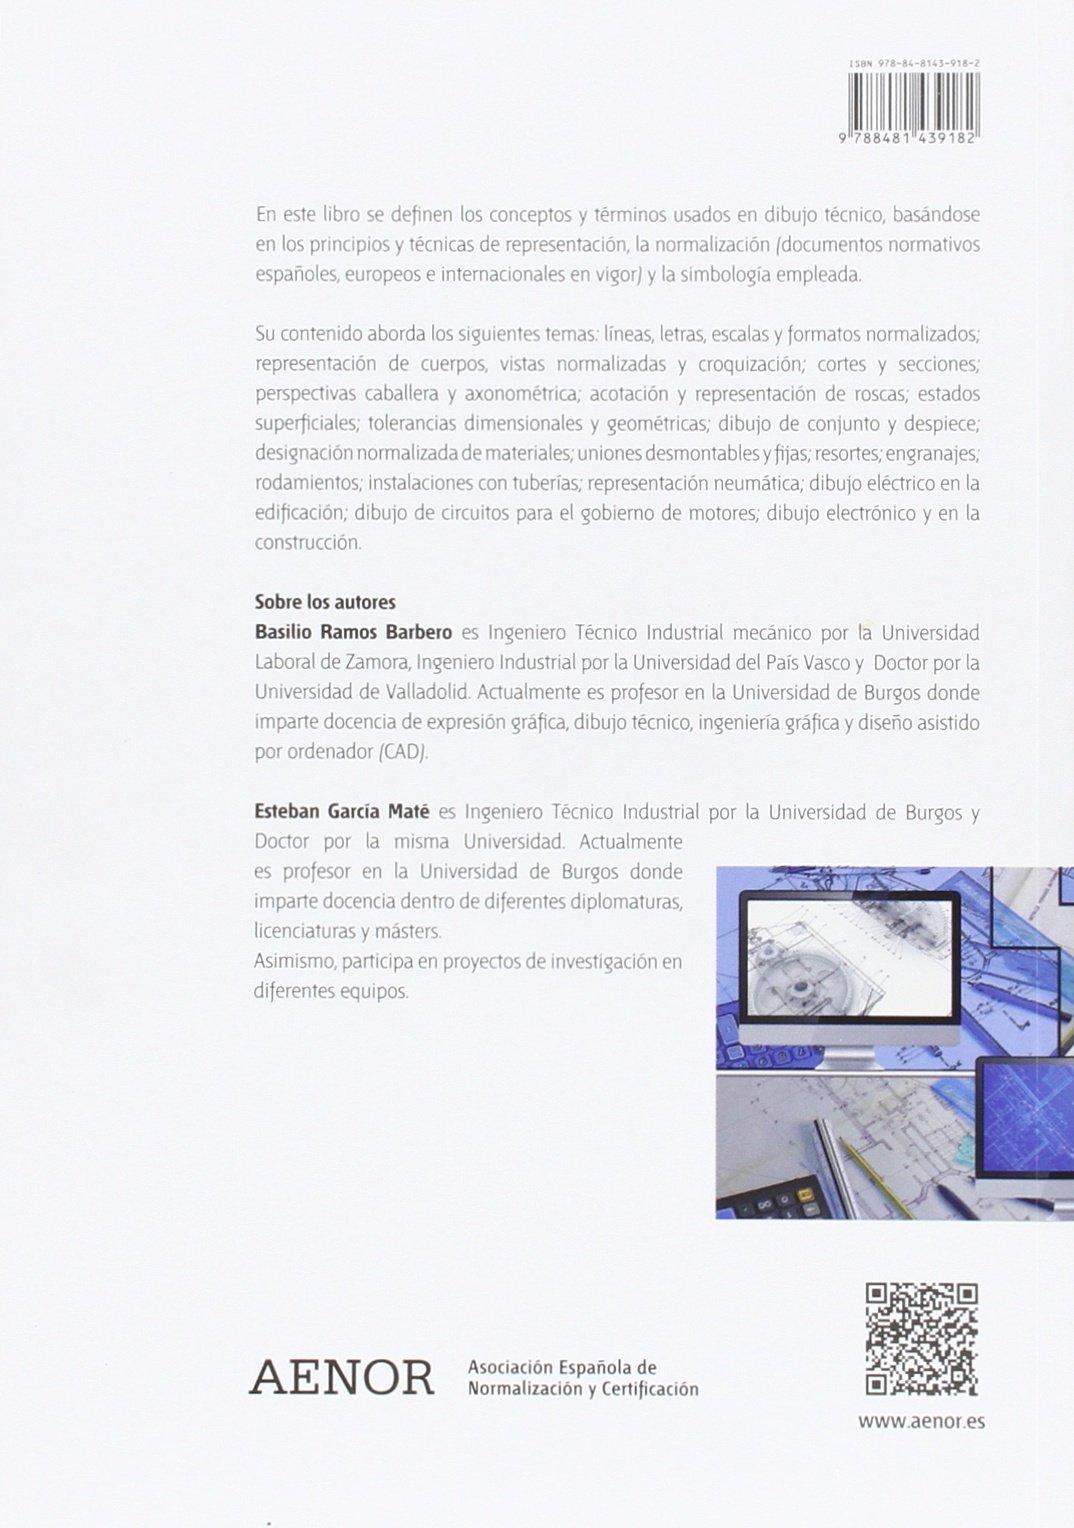 Dibujo tcnico Amazones Basilio Ramos Barbero Esteban Garca